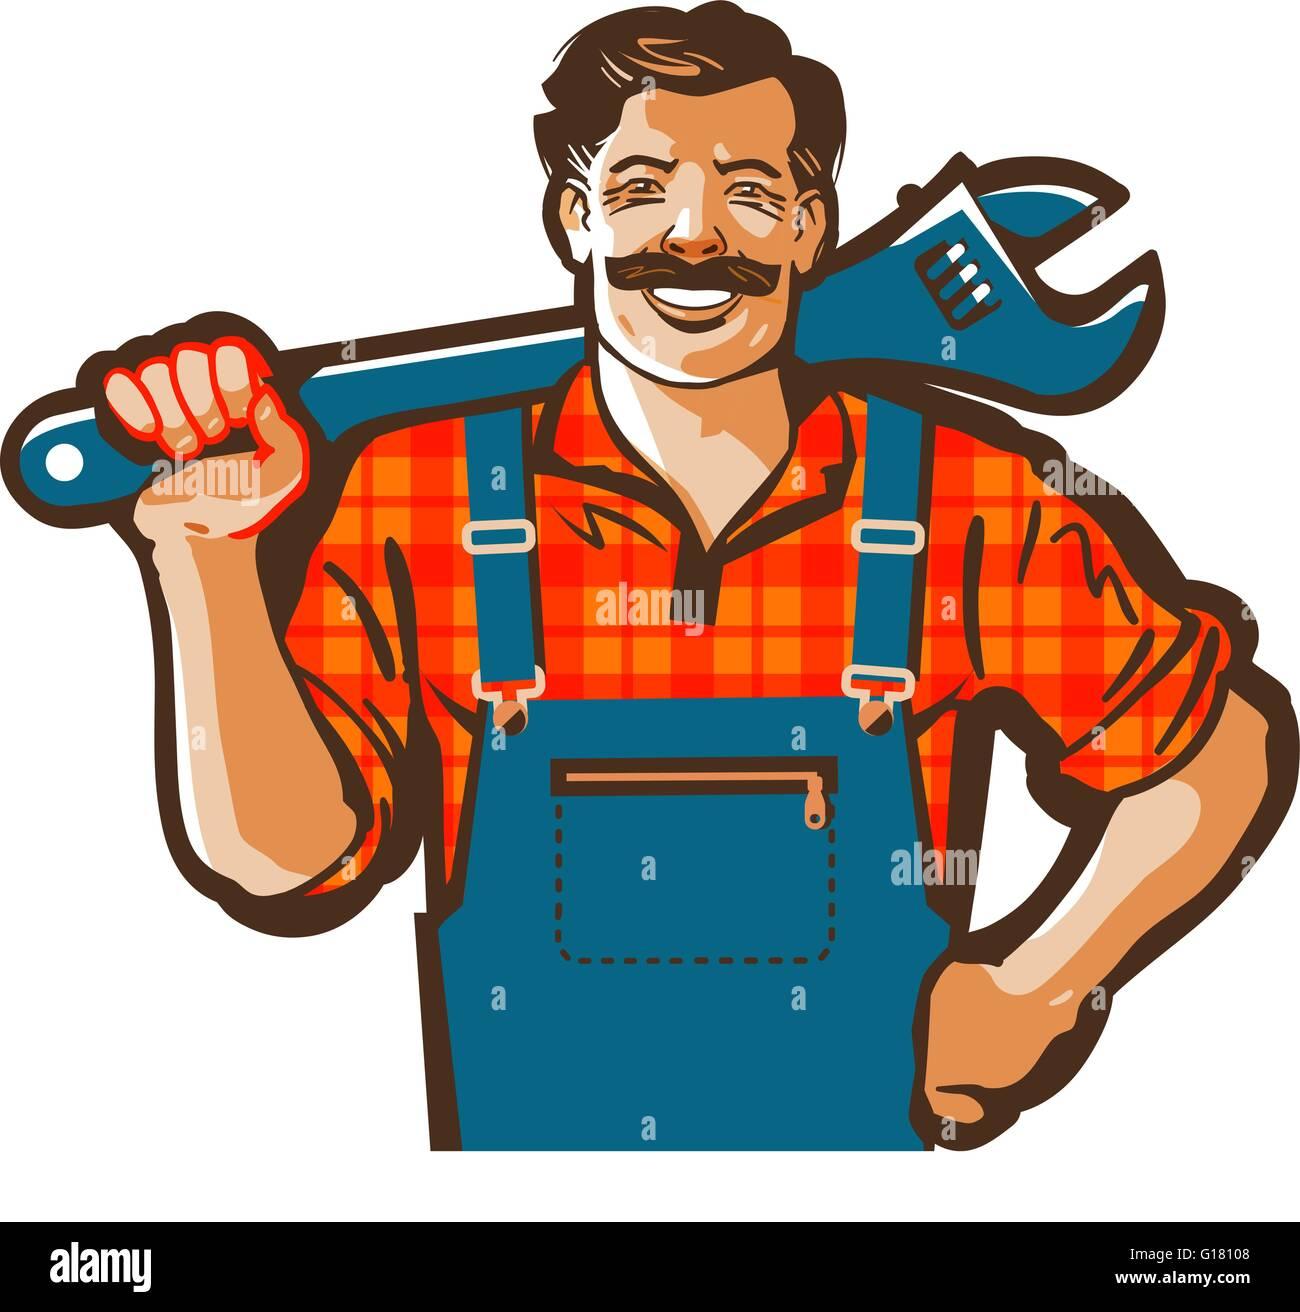 plumber vector logo wrench or handyman icon stock vector art